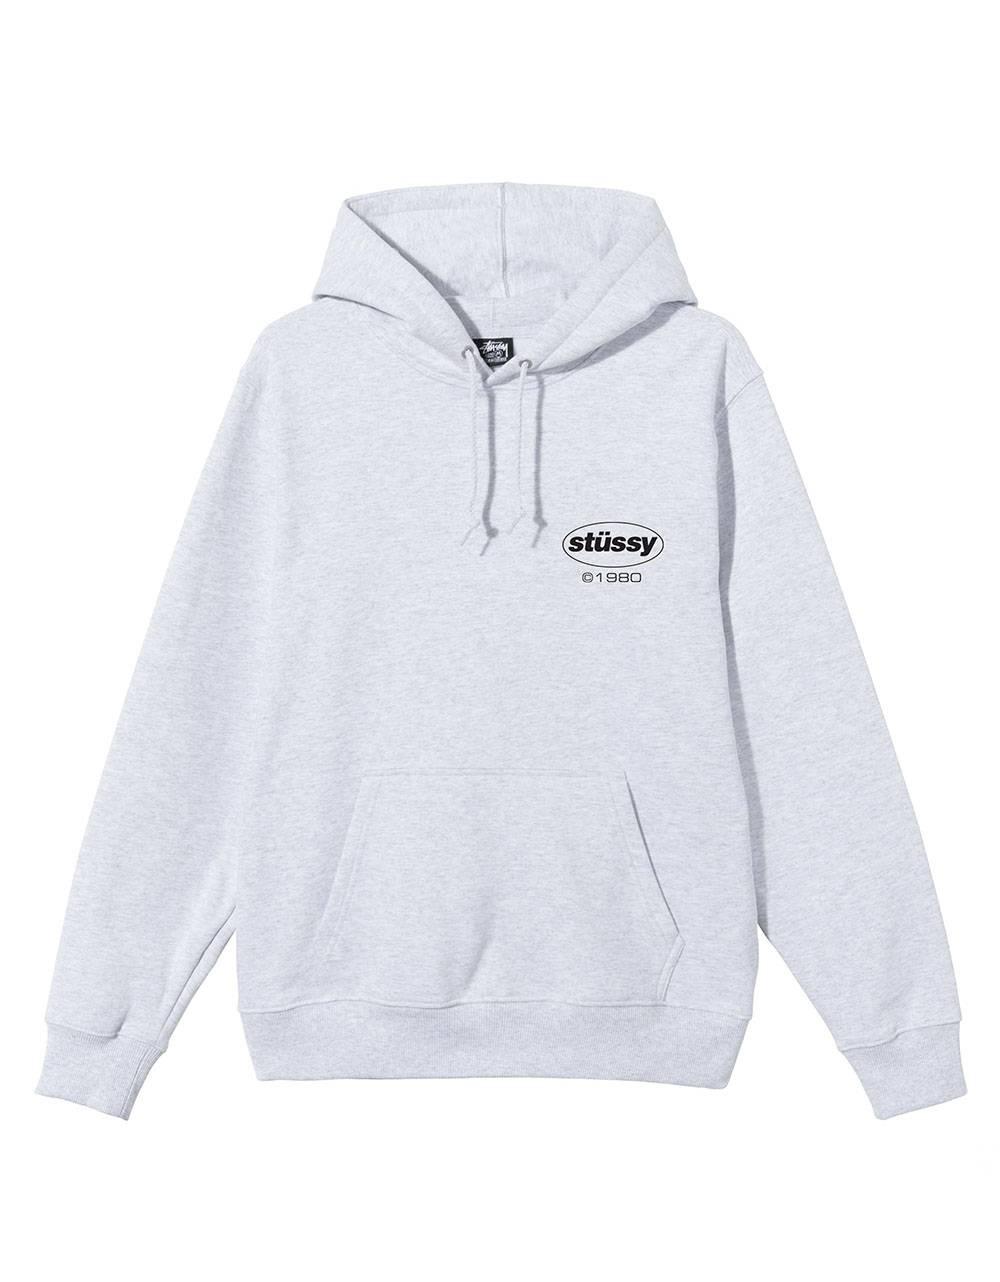 Stussy Soul hoodie - Ash heater Stussy Sweater 119,00€